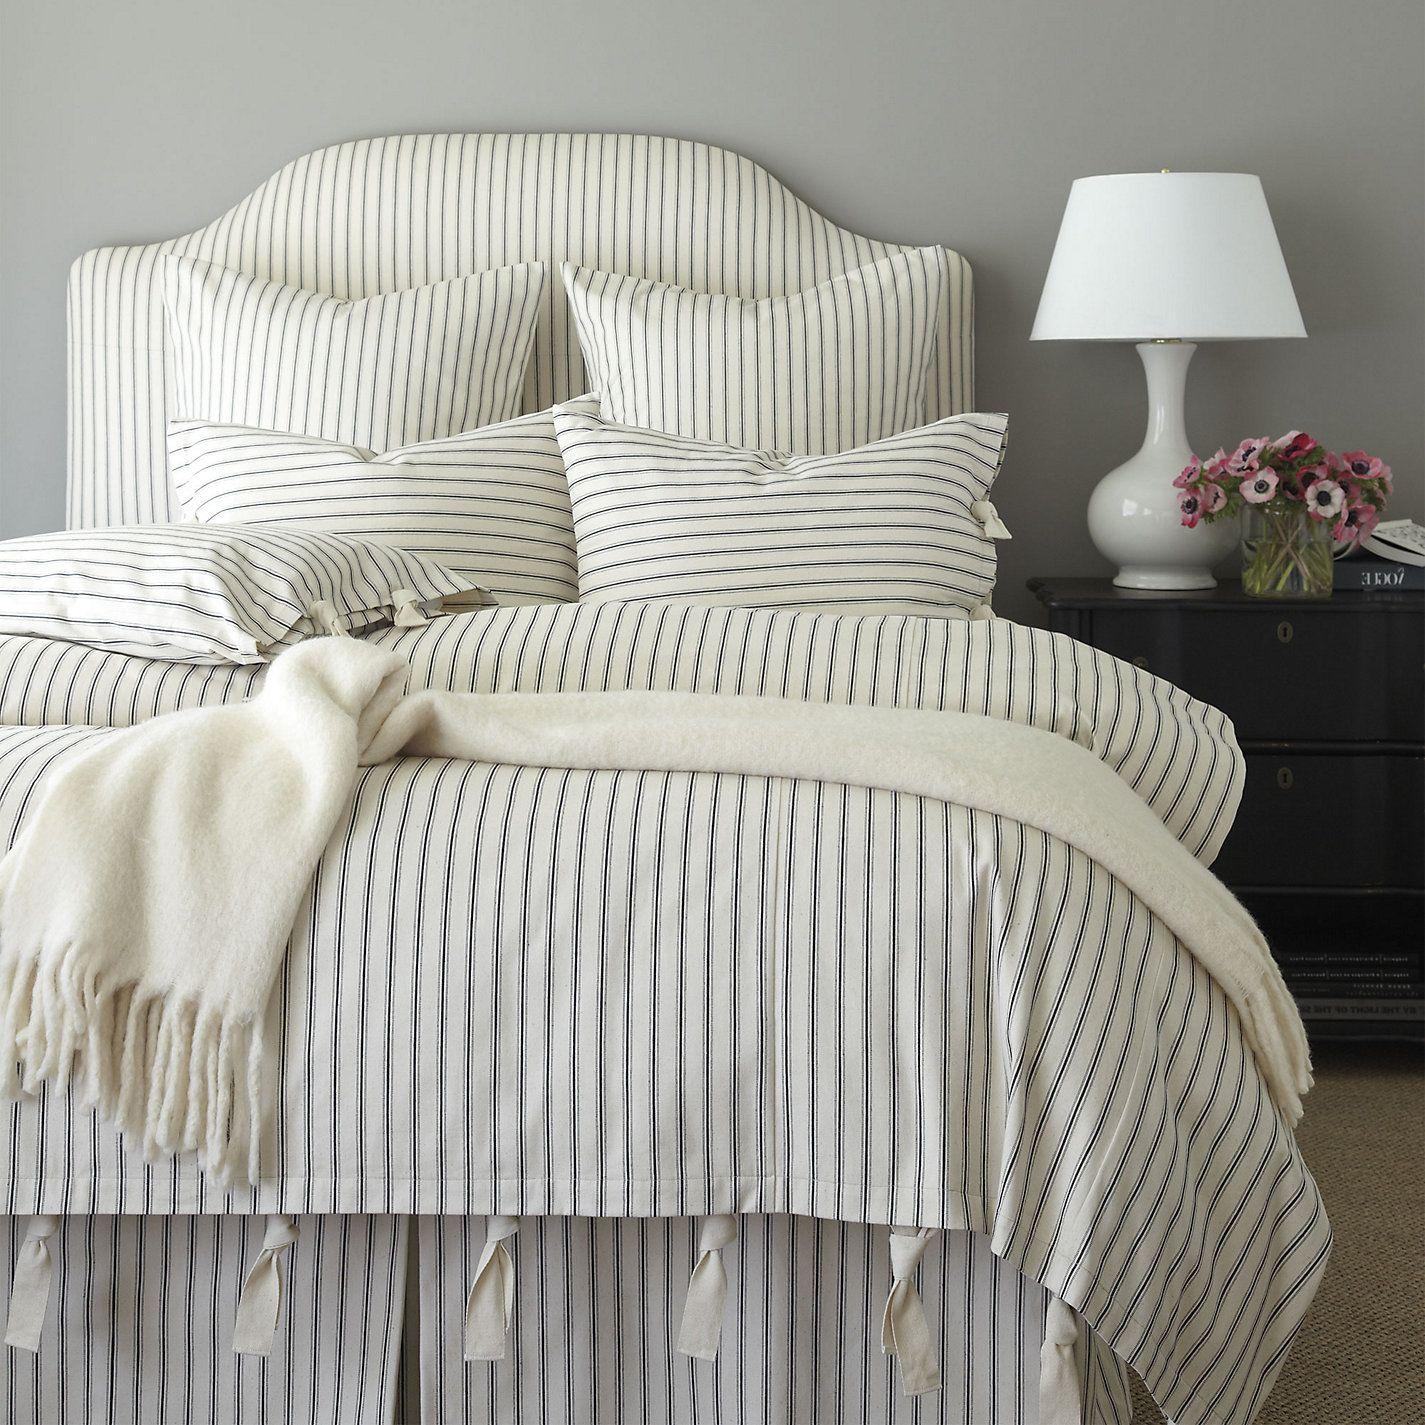 Ticking Stripe Duvet Navy Ballard Designs Ticking Stripe Bedding Bedroom Vintage Striped Bedding